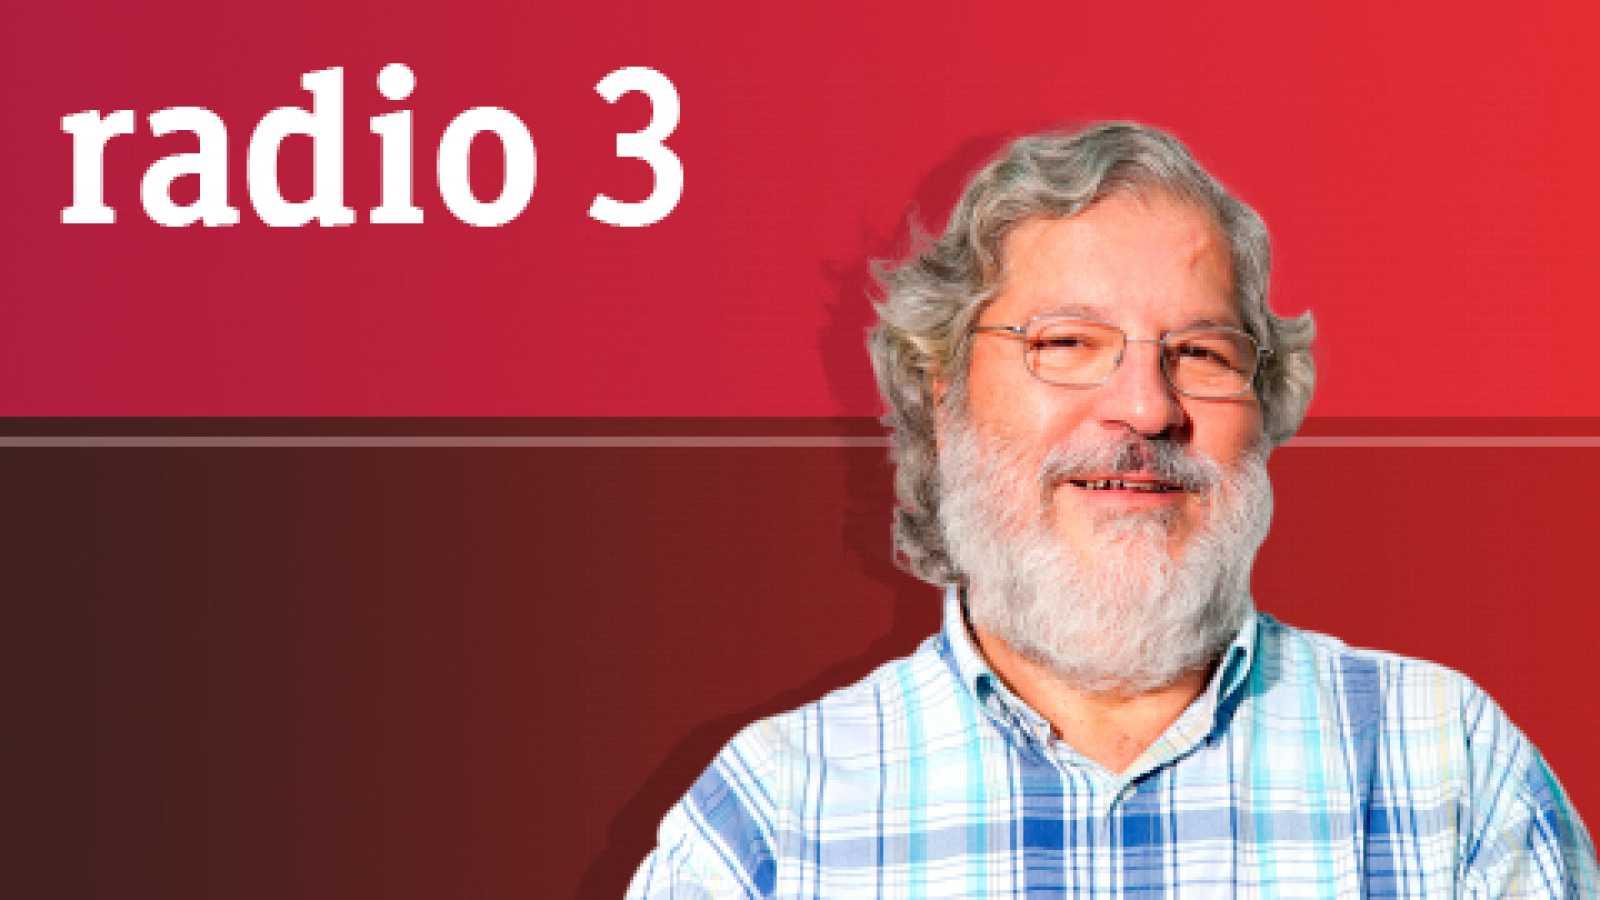 Discópolis 10.756 - Juan Manuel Cidrón - 13/11/19 - escuchar ahora